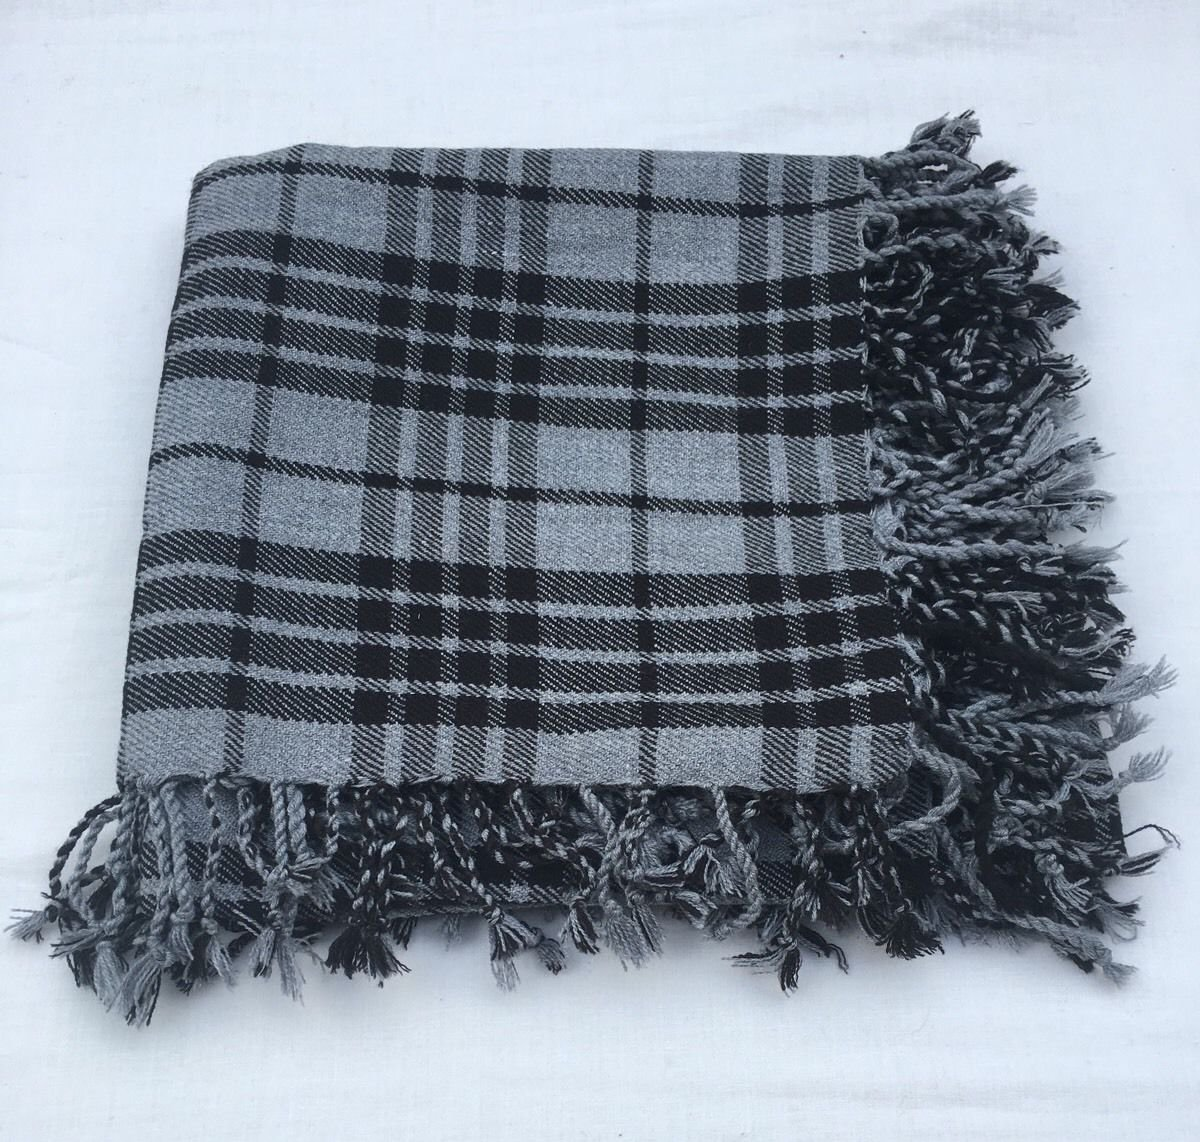 "Gray Watch Scottish Kilt Tartan Fly Plaid 48"" x 48"" Highland Kilt Gray Watch Fly plaid Shawl"